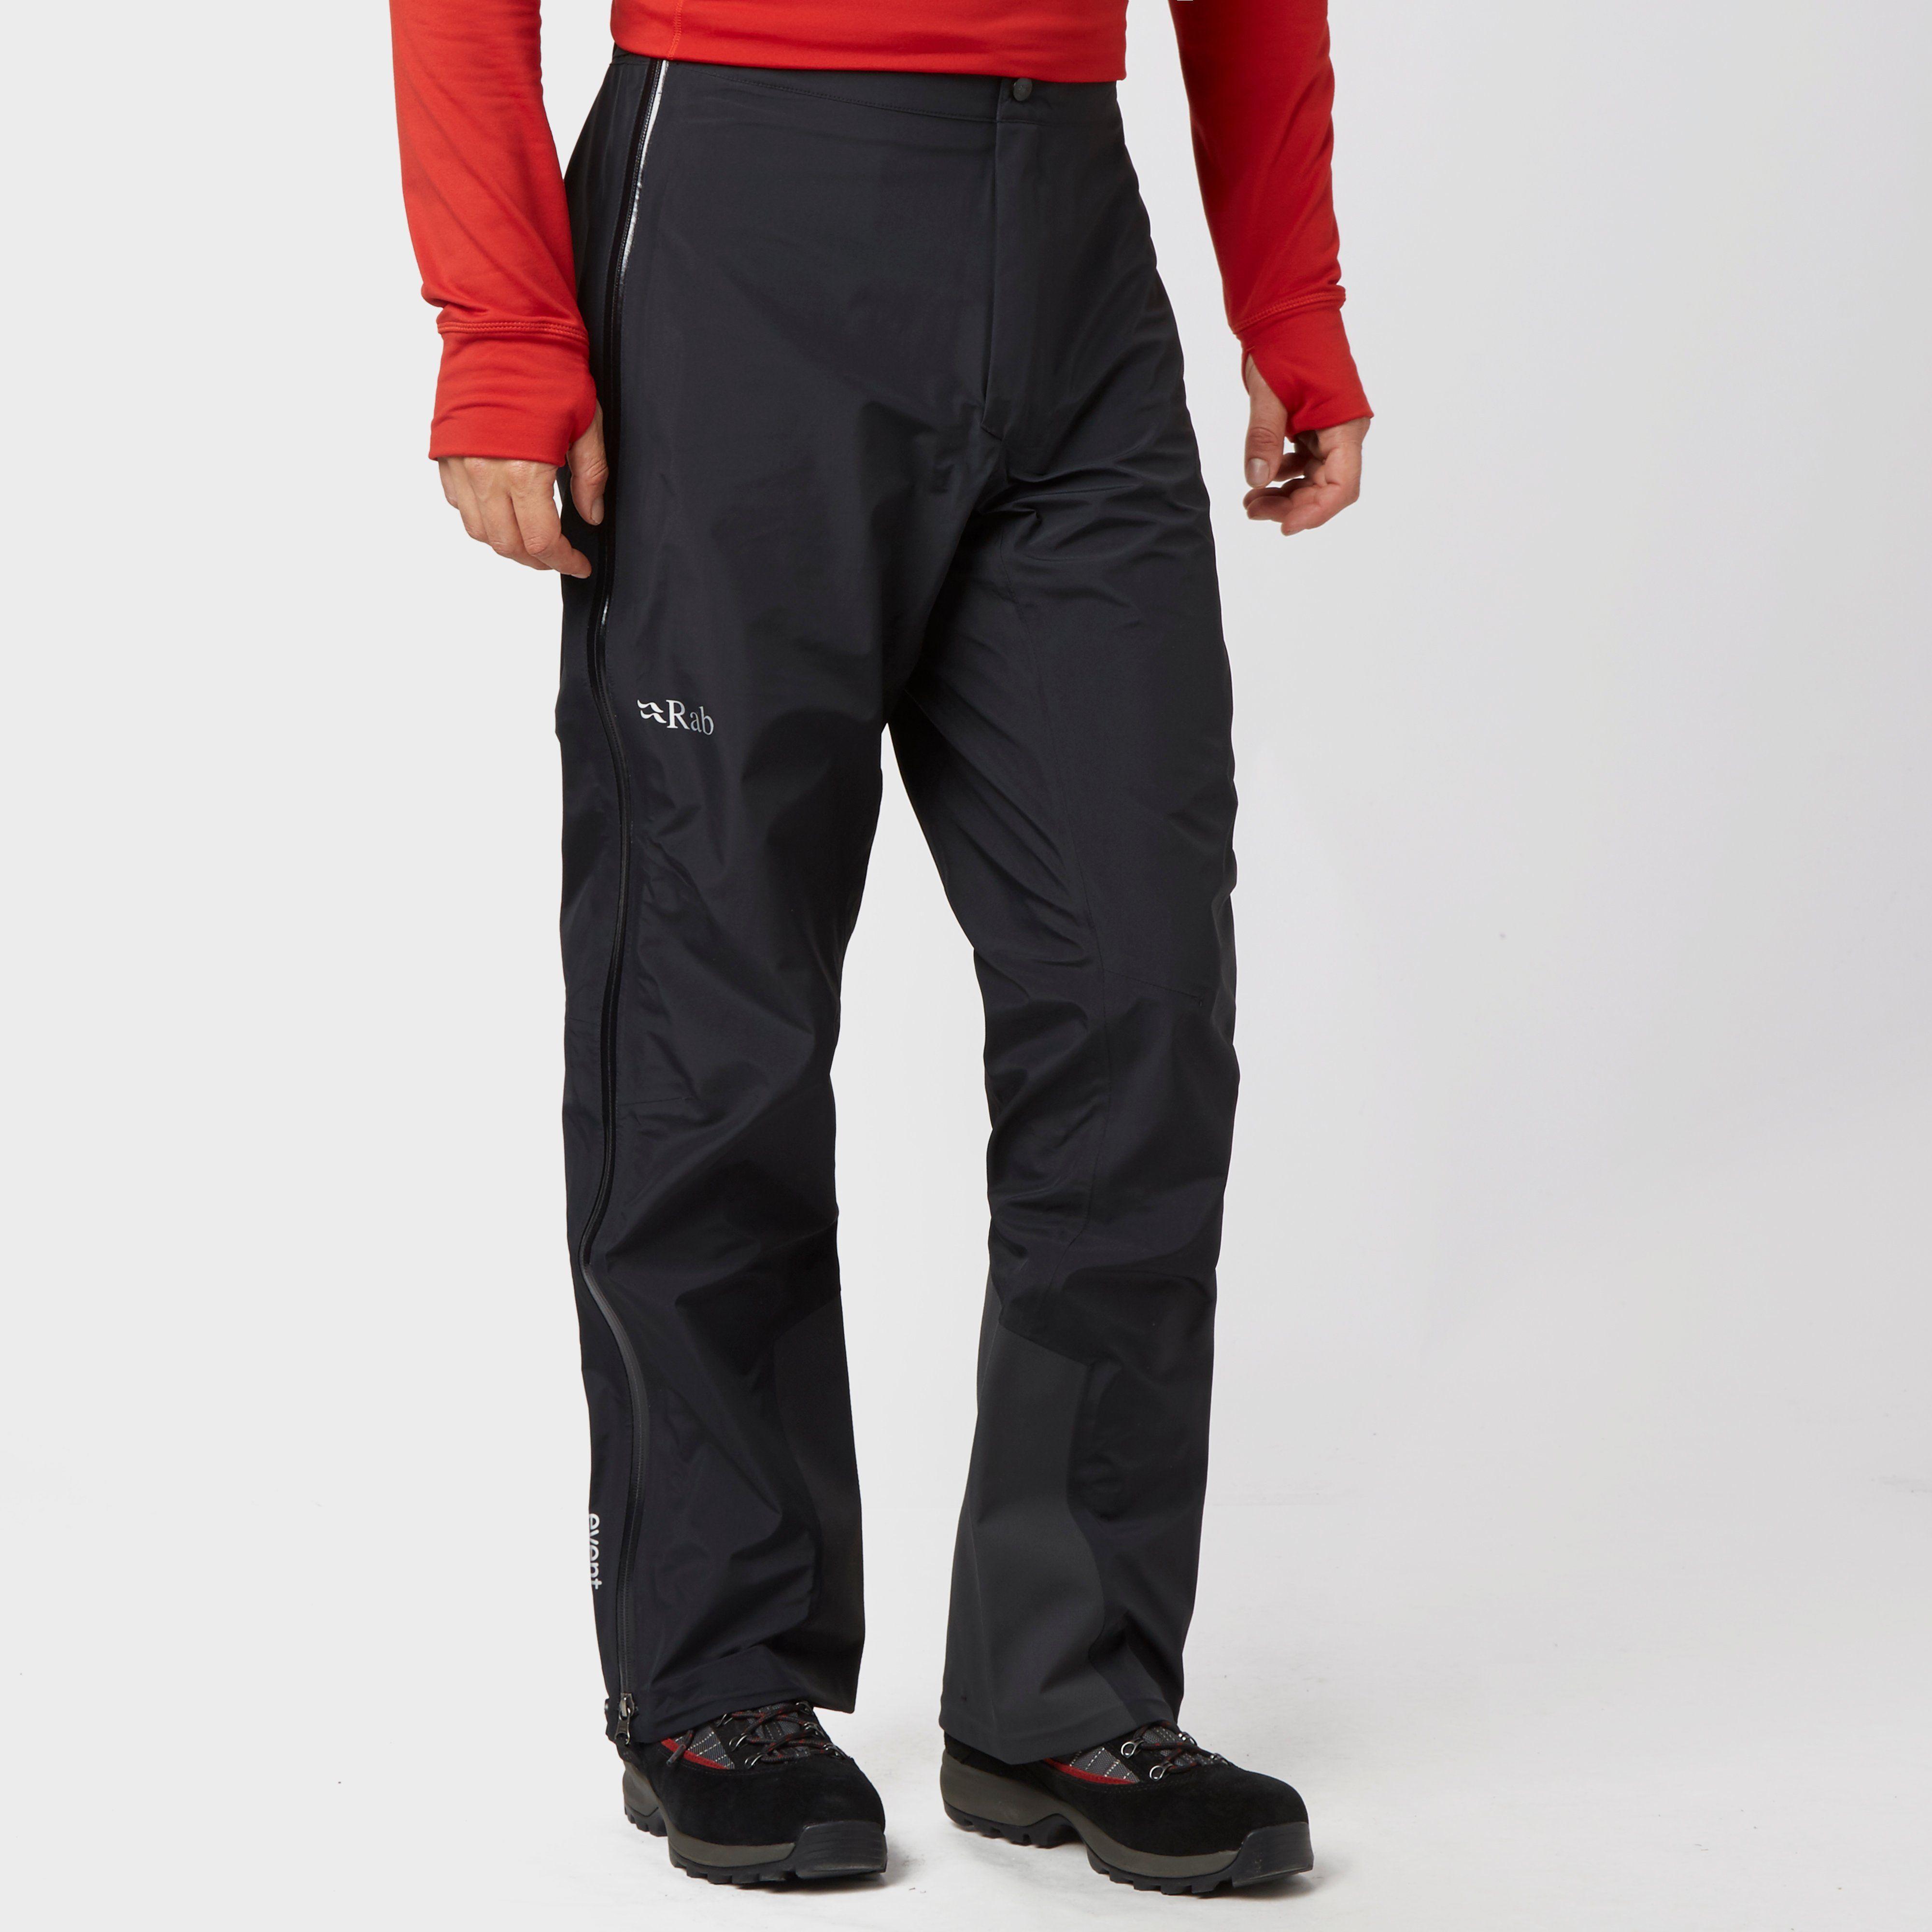 RAB Men's Latok Alpine Pants